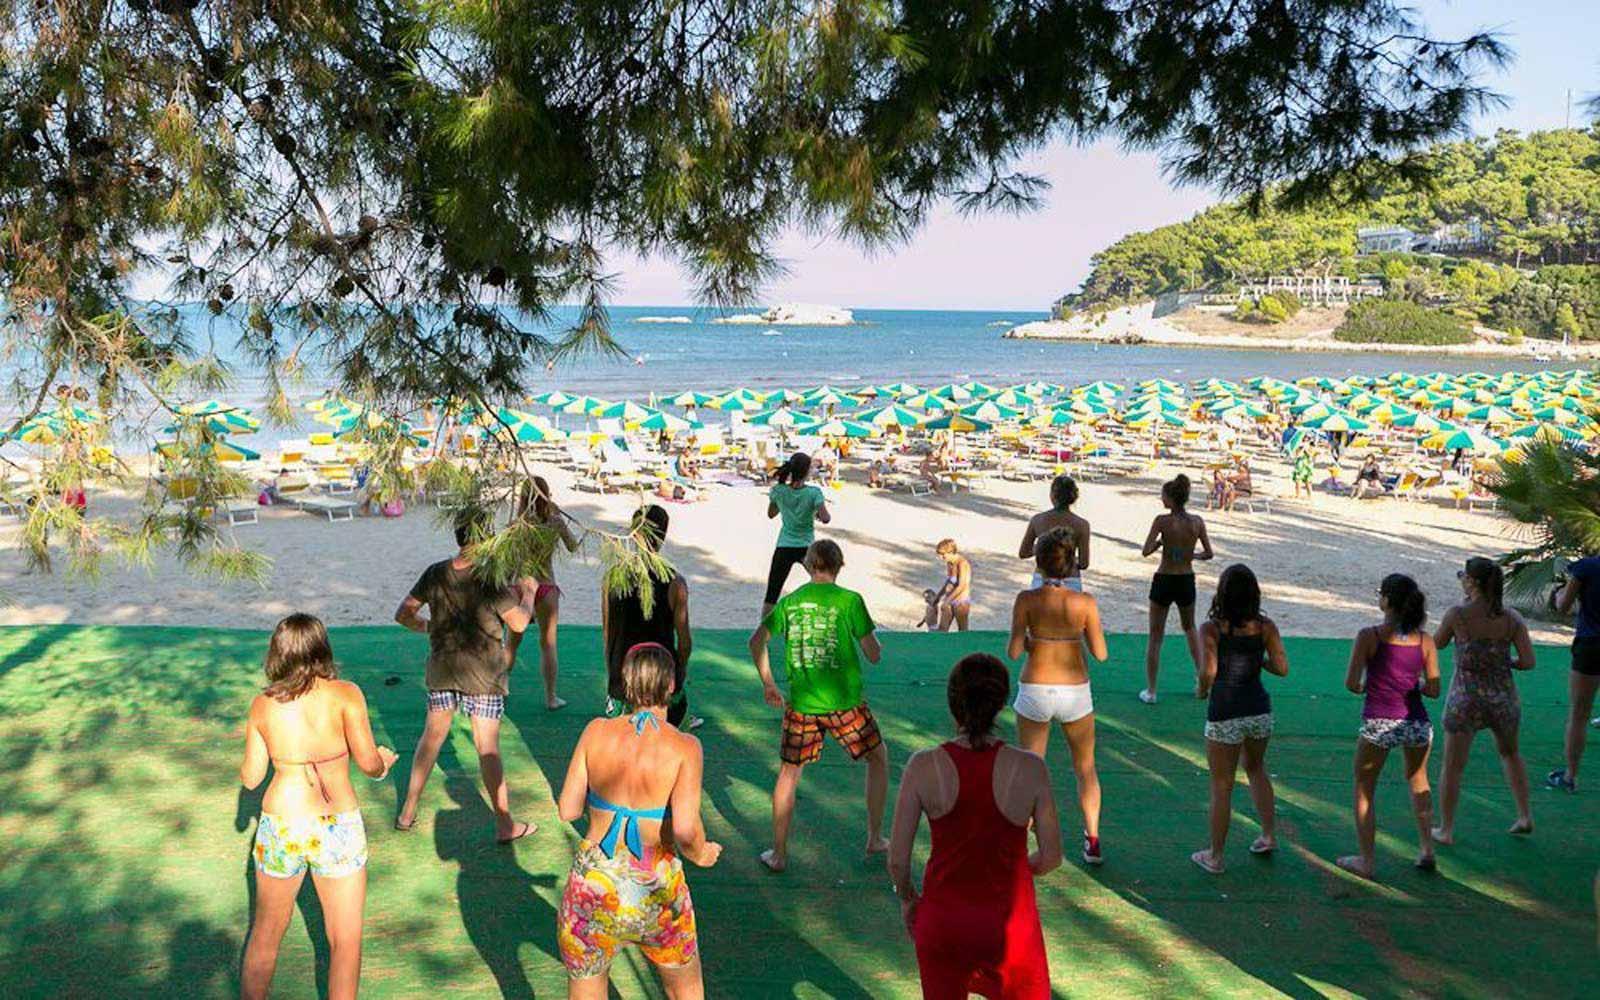 Fitness activities at the Gattarella Resort